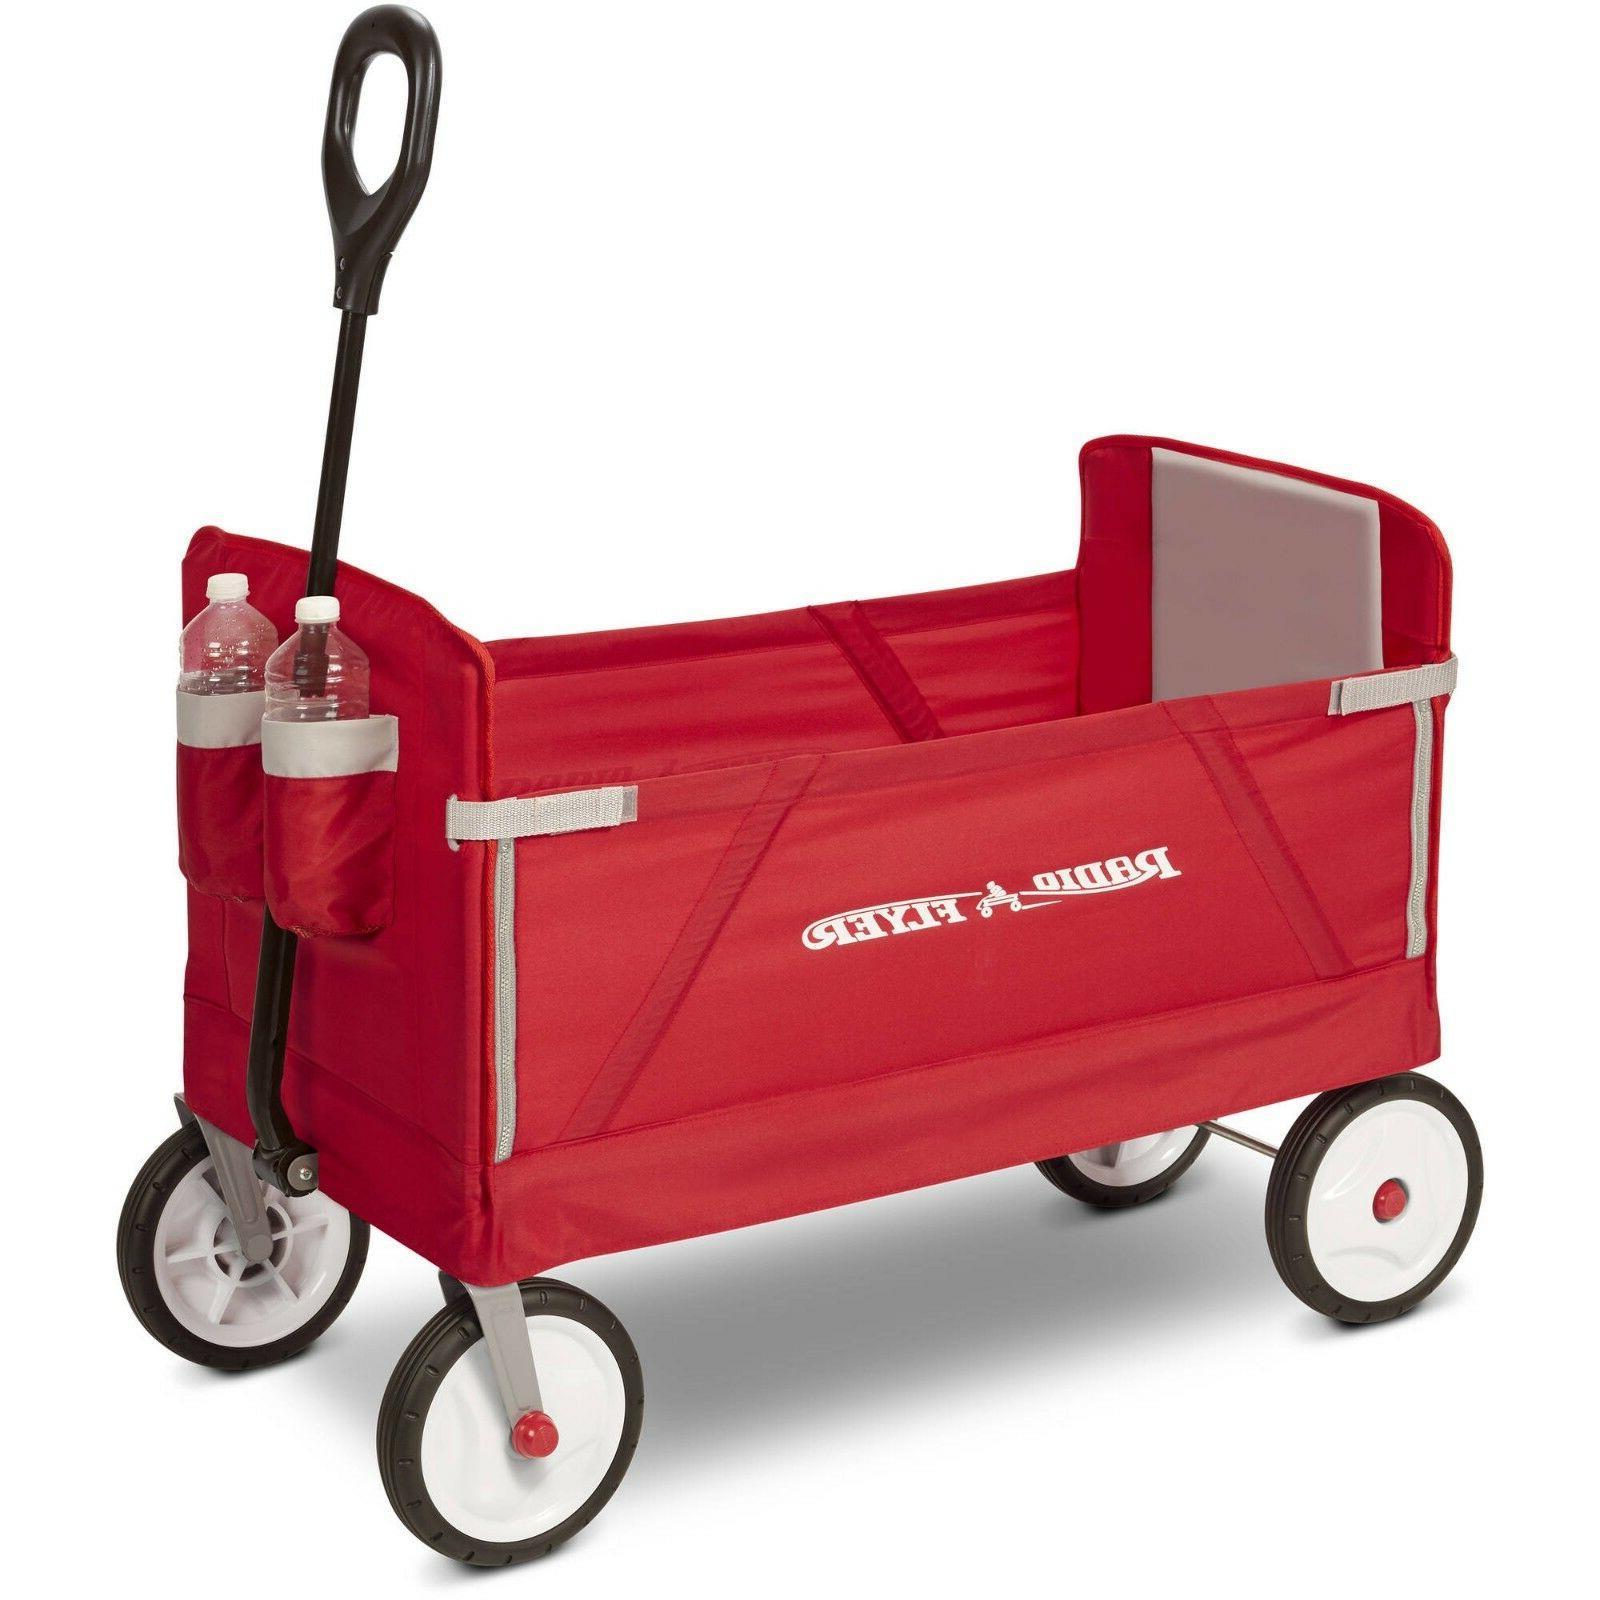 trail folding wagon cart collapsible terrain utility